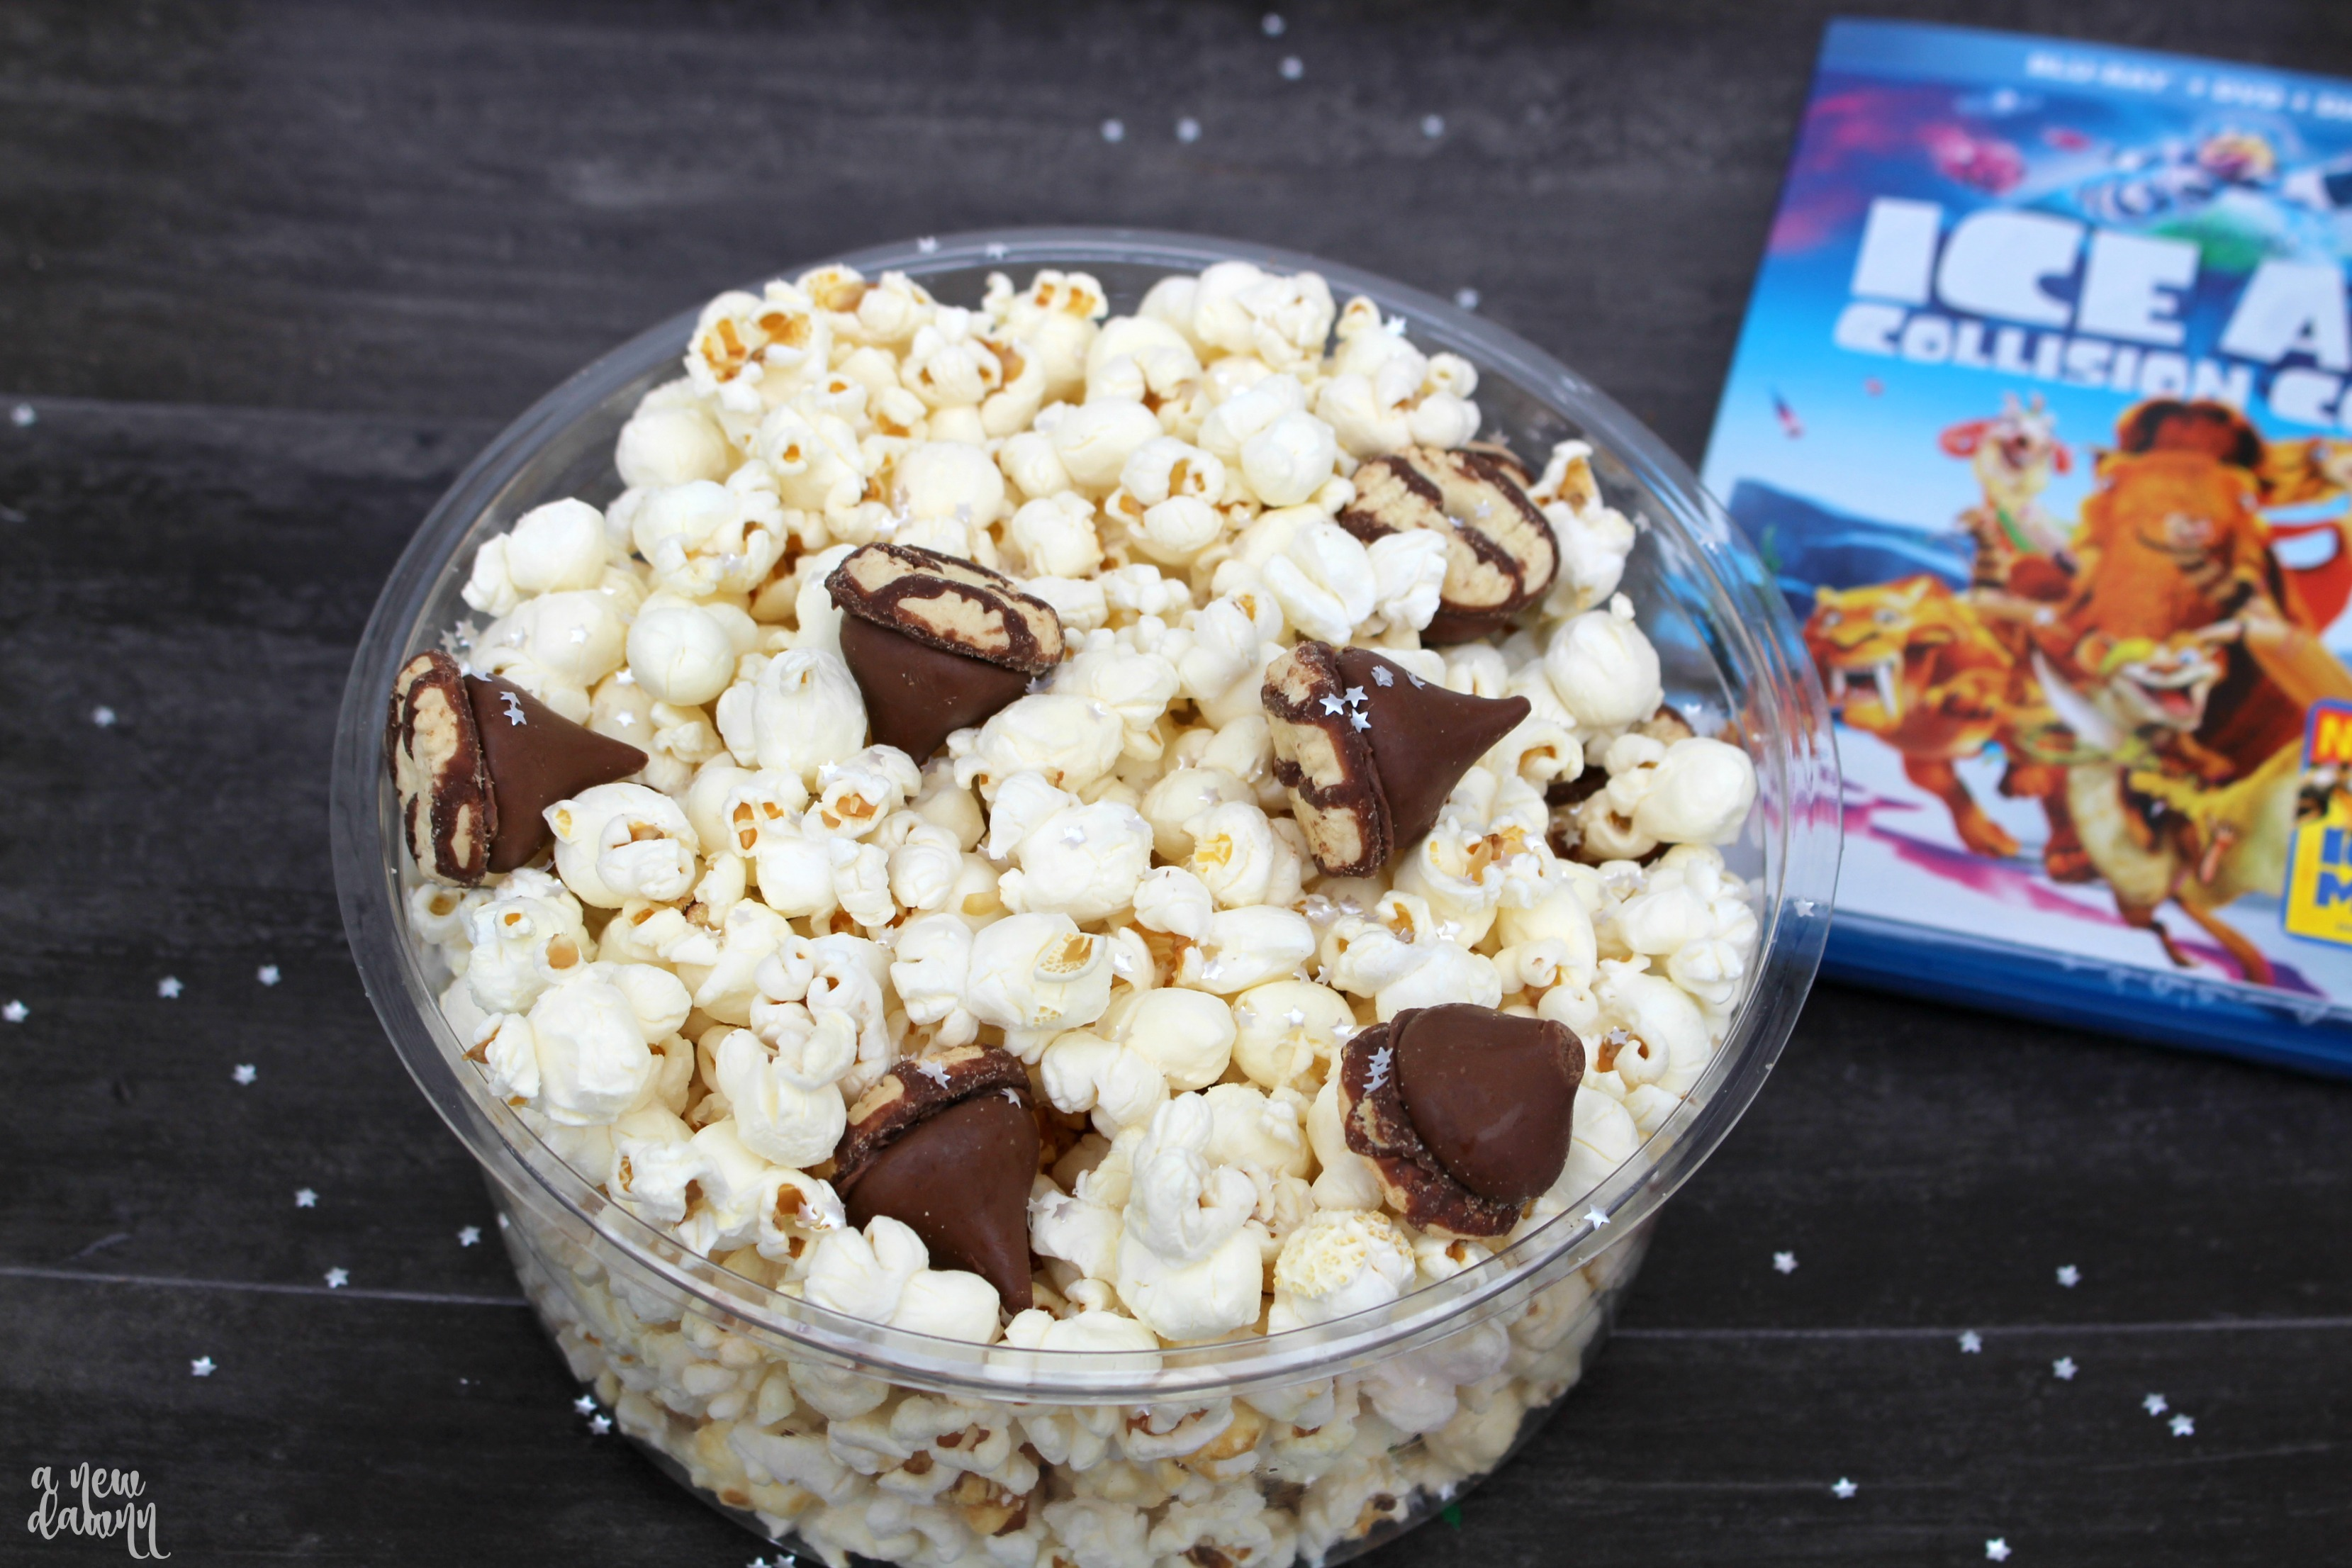 Ice Age Popcorn Recipe